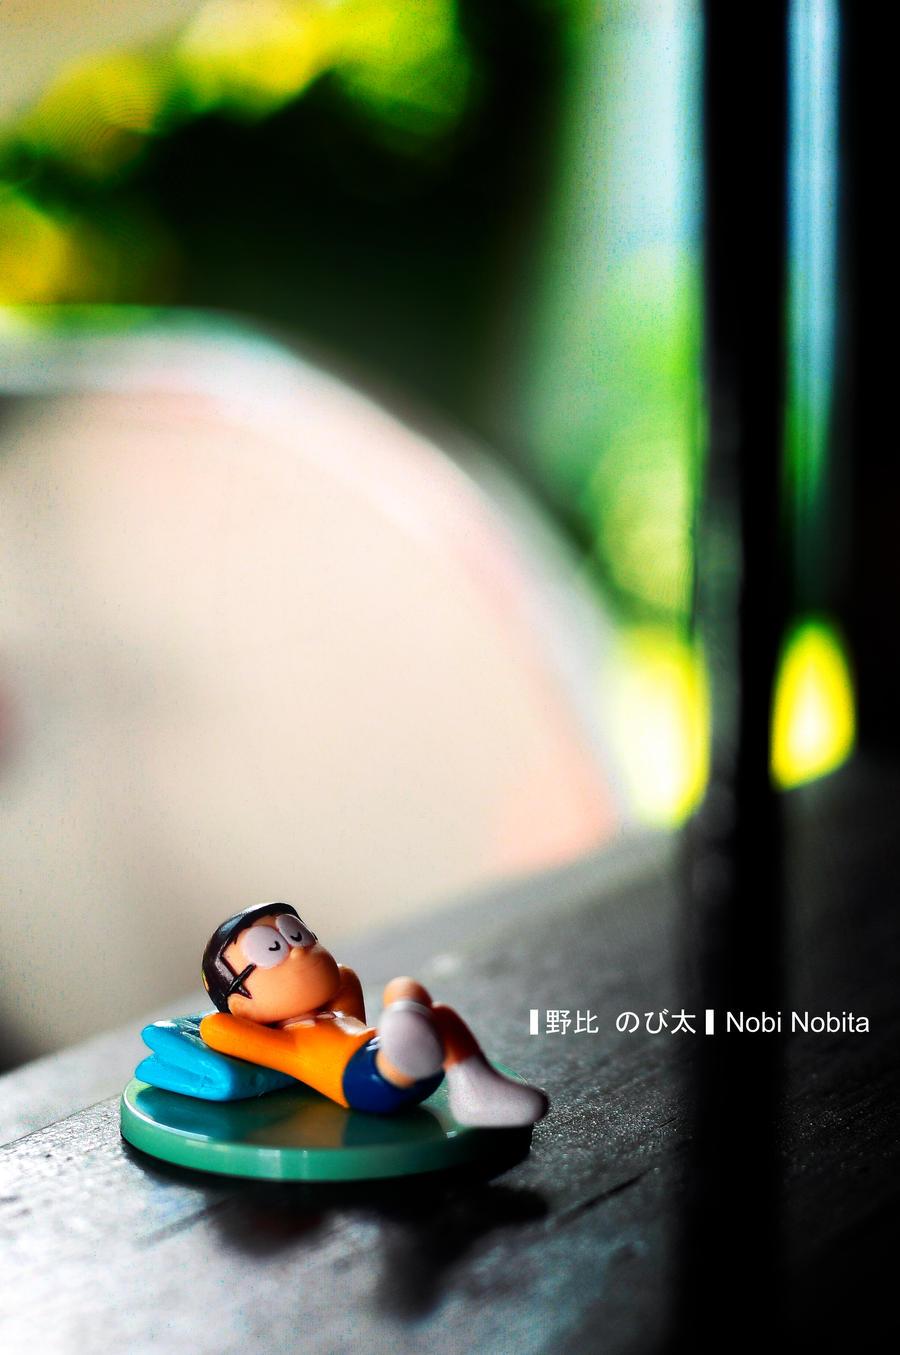 Nobi Nobita by faris18787